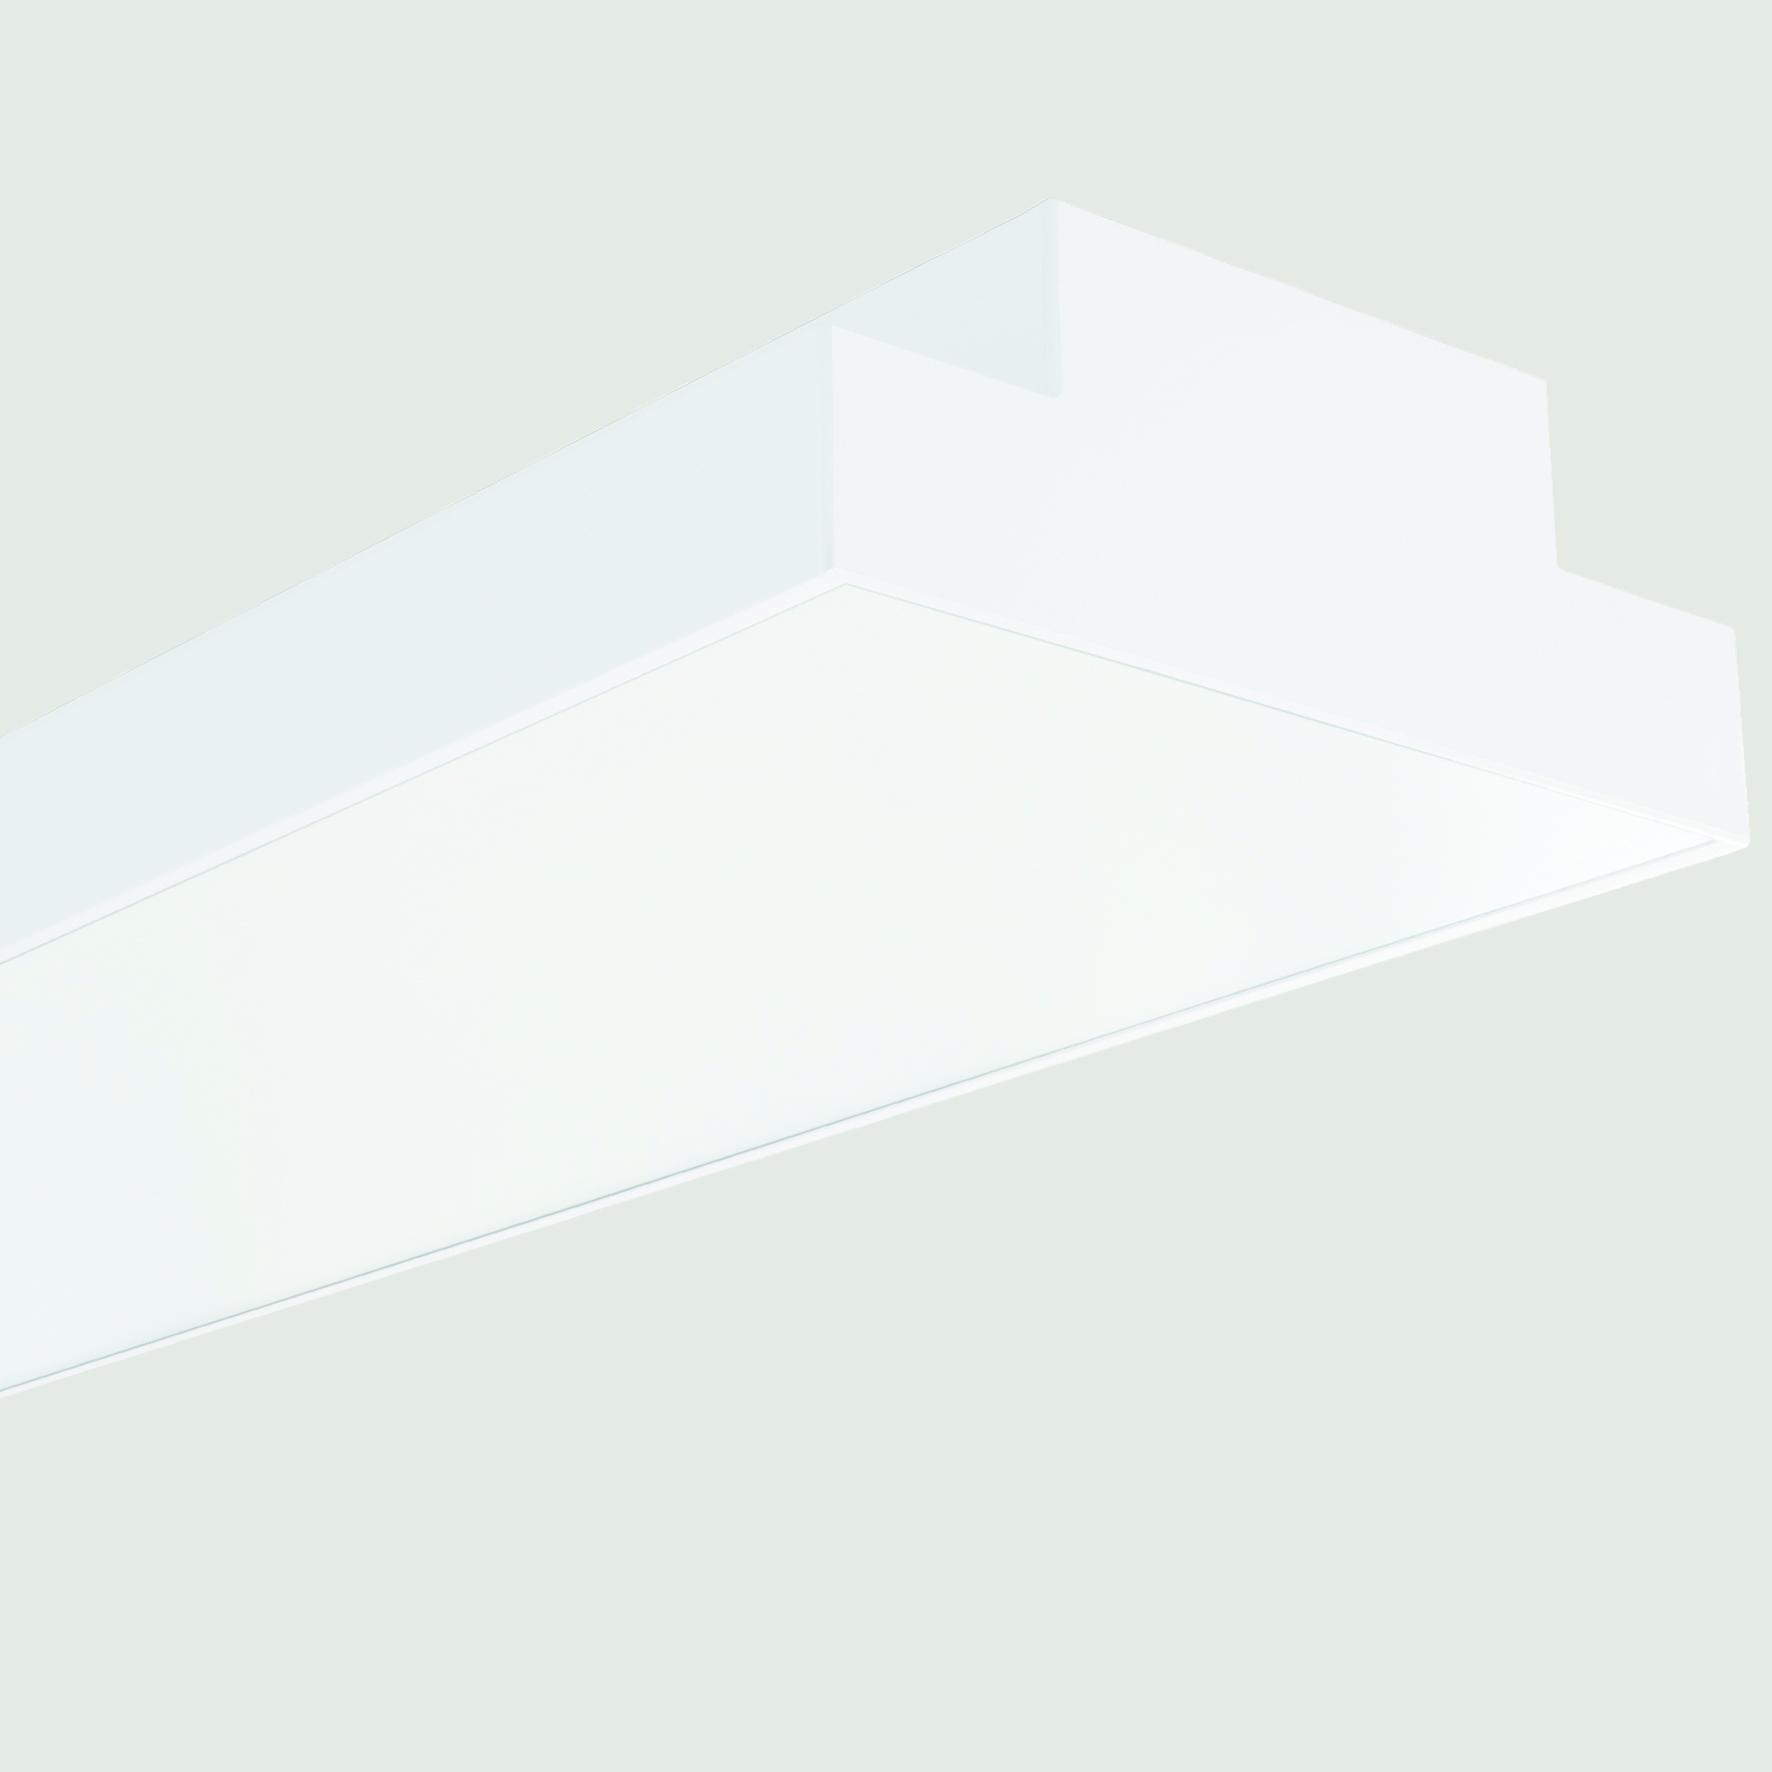 NEM180O-profilleuchte-weiß-sml-led